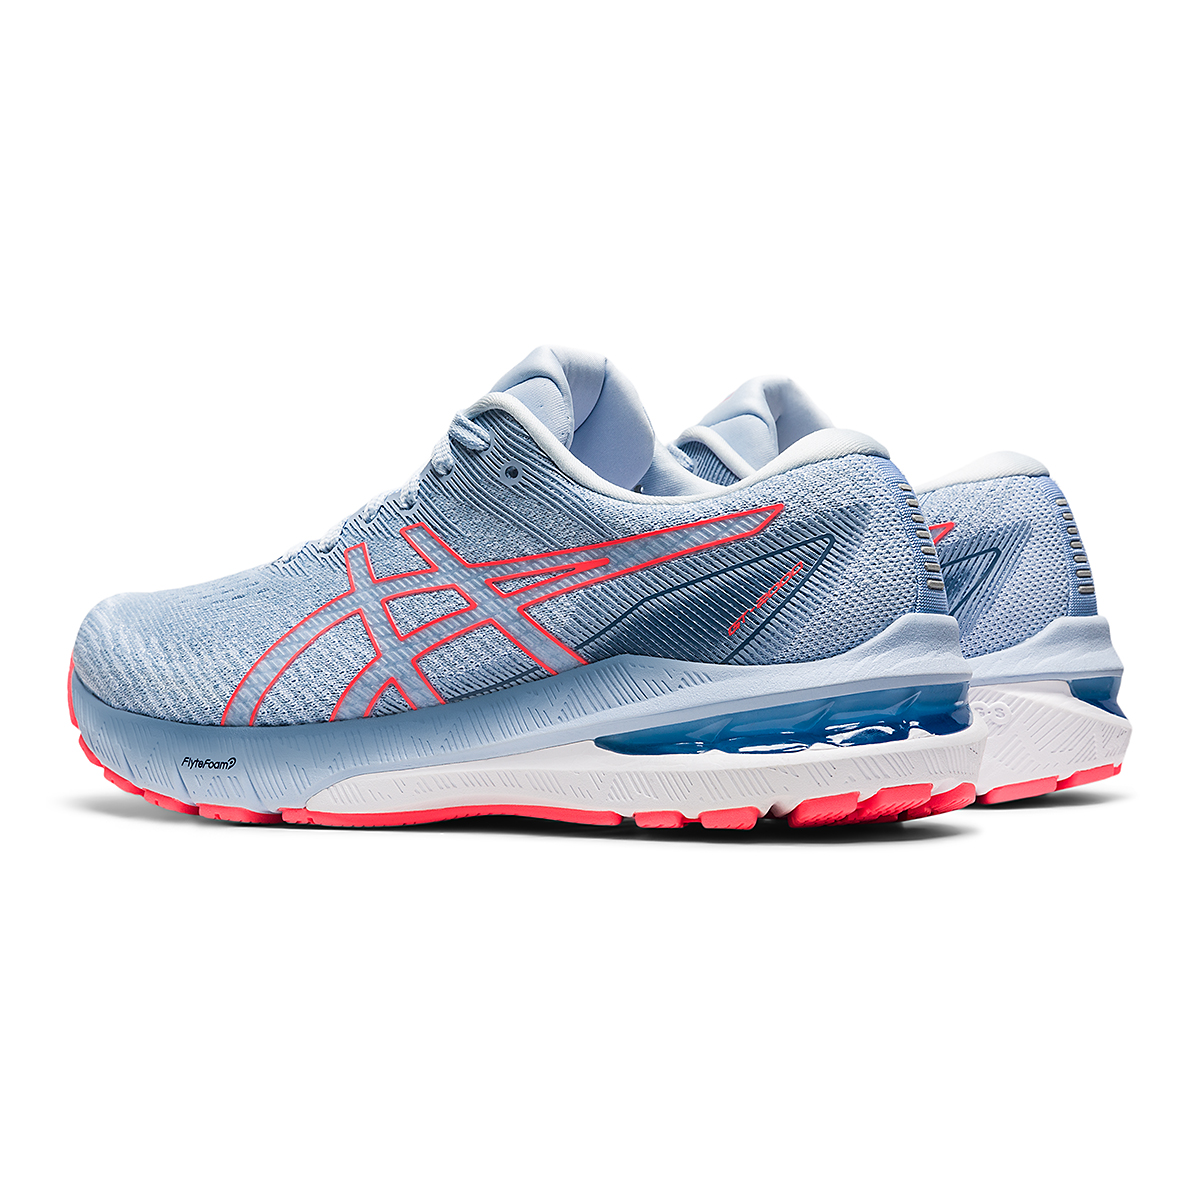 Women's Asics GT-2000 10 Running Shoe - Color: Mist/Blazing Coral - Size: 5 - Width: Regular, Mist/Blazing Coral, large, image 4